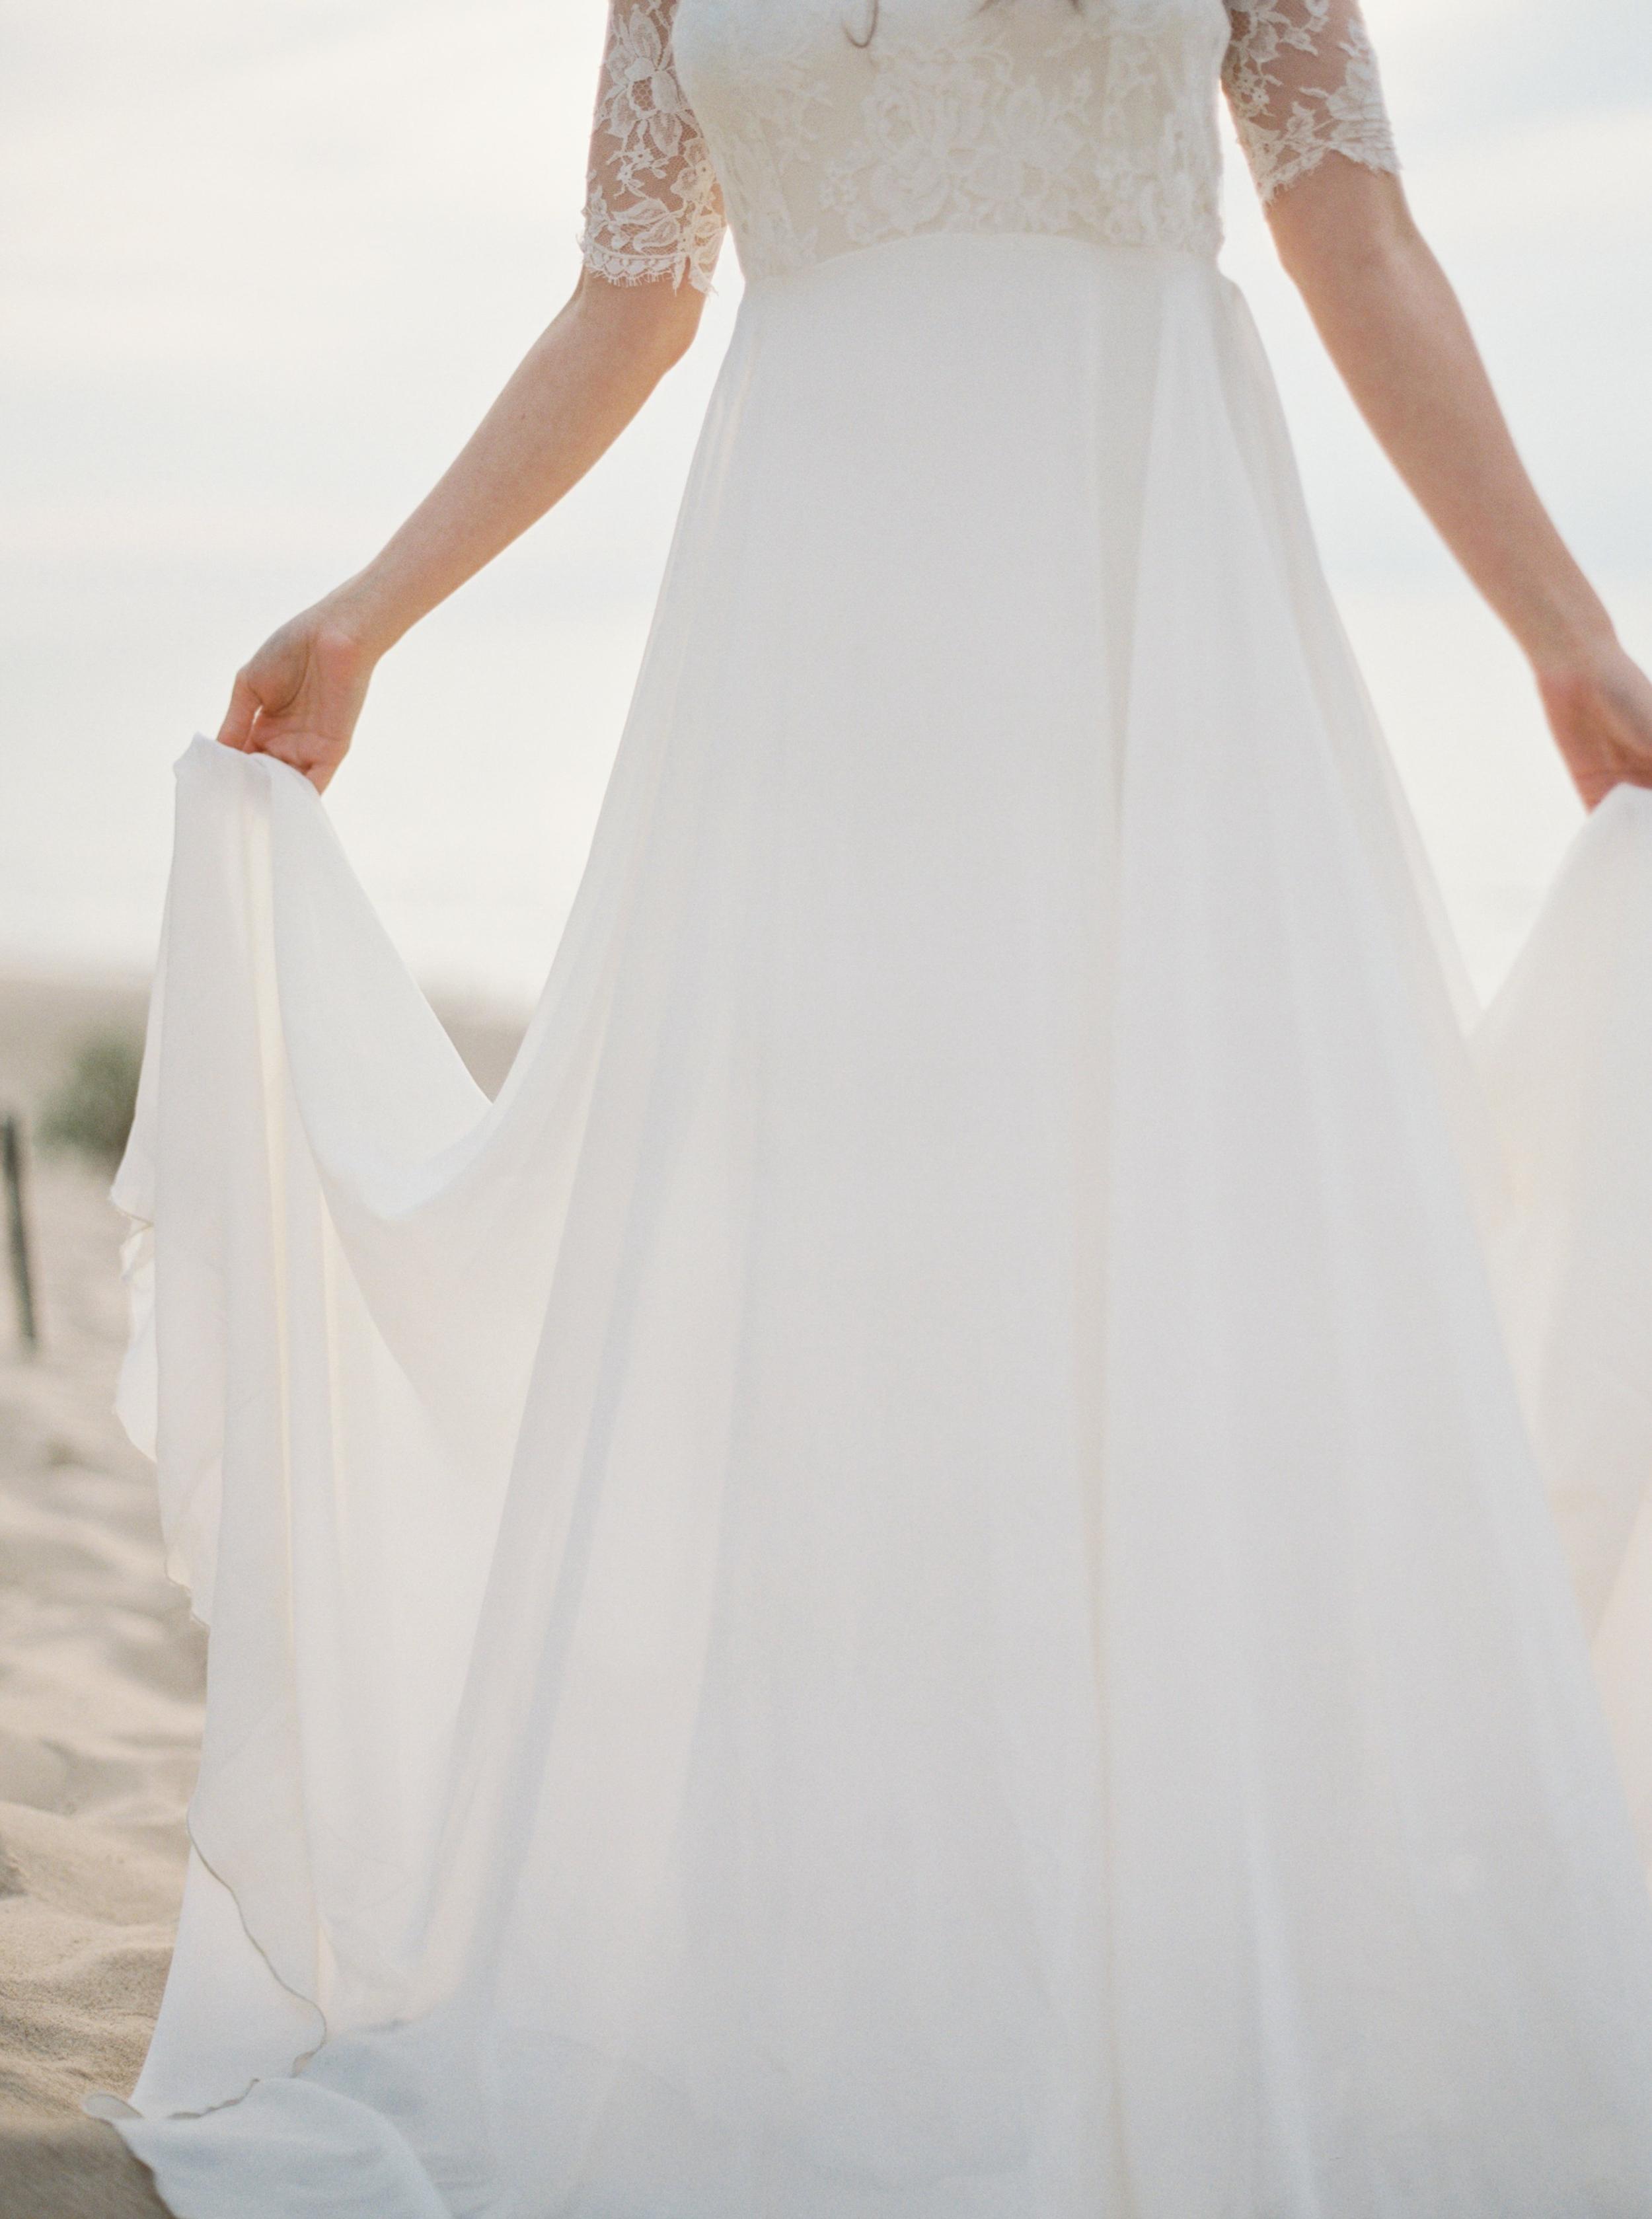 Kyle John l Fine Art Wedding Photography l Chicago, Copenhagen, California, New York, Destination l Blog l Jessica W_1